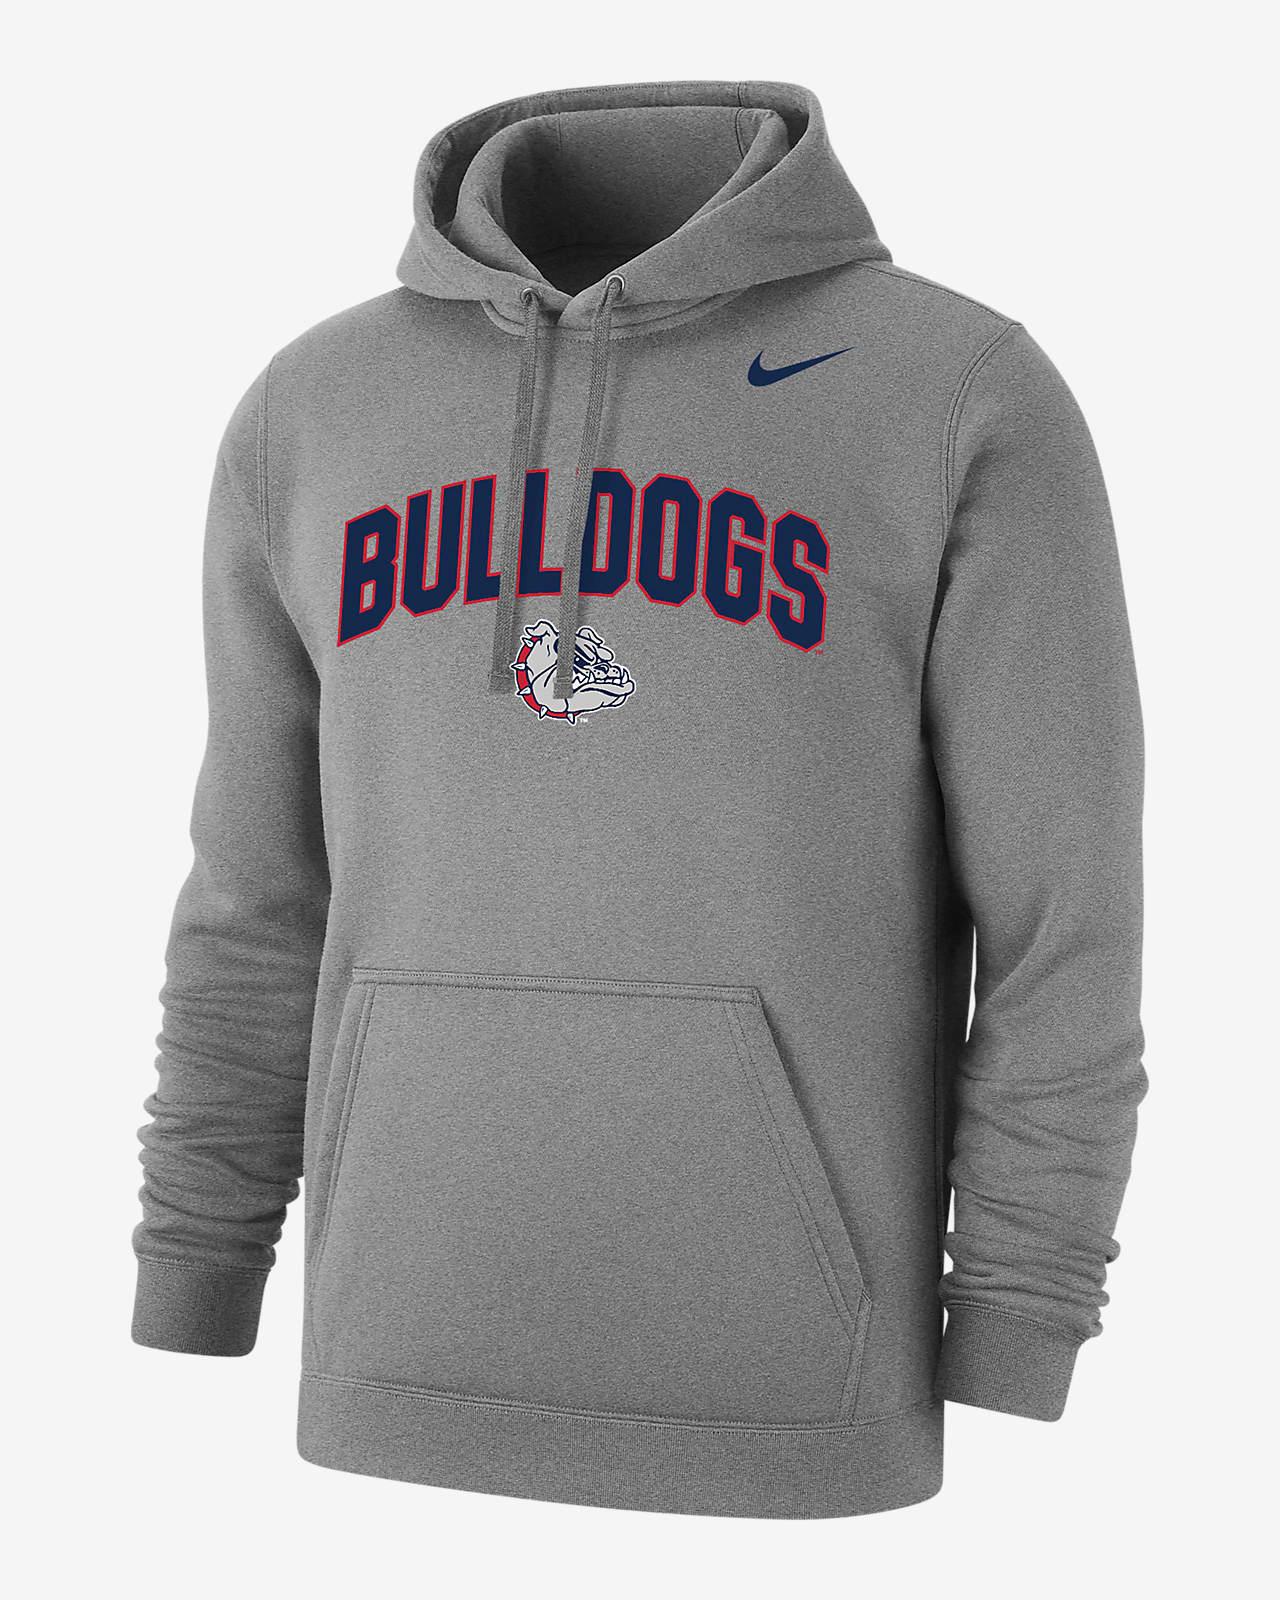 Nike College Club Fleece (Gonzaga) Men's Hoodie